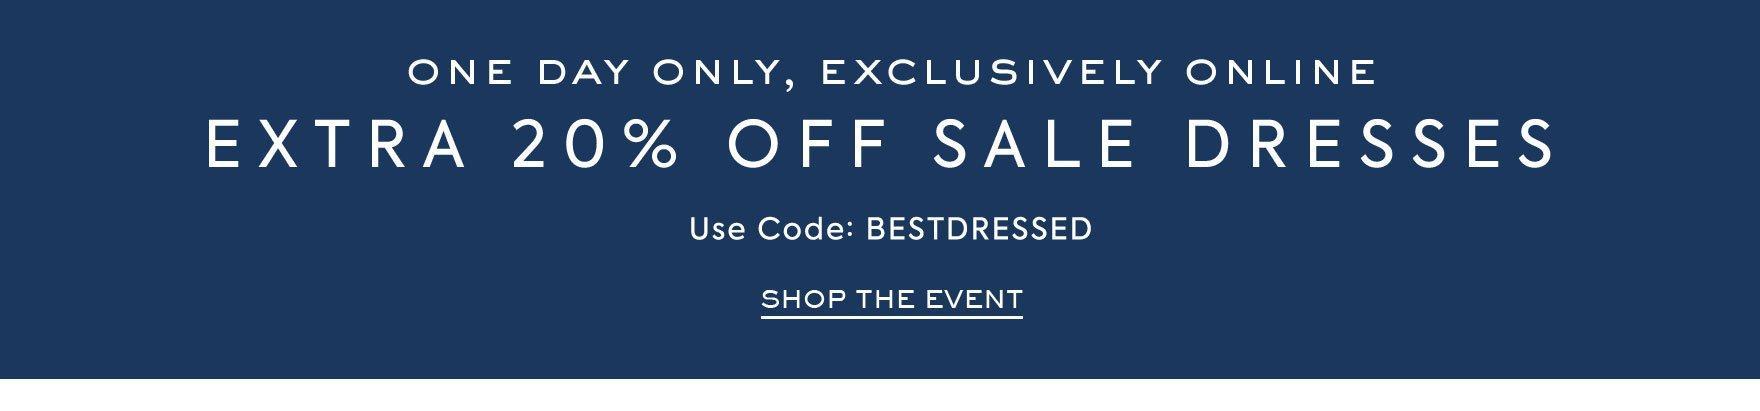 Shop Girl Sale Dresses